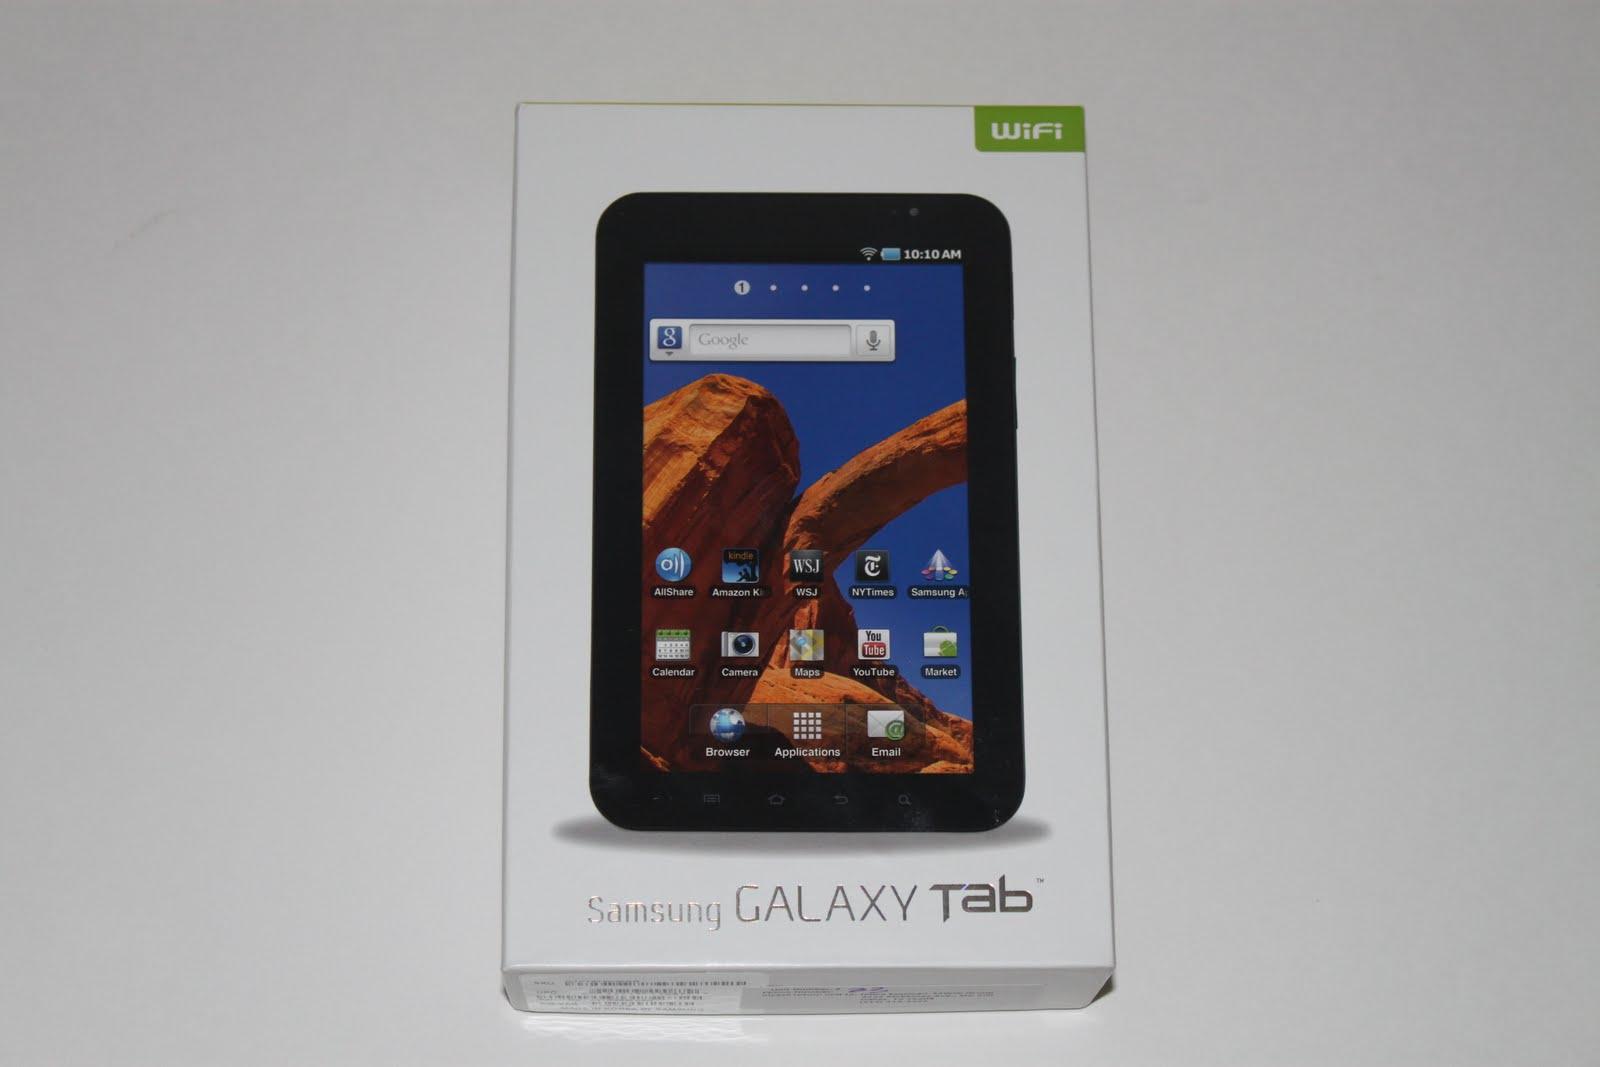 Stereowise Plus: Samsung Galaxy Tab 7 and Galaxy Tab 10 1